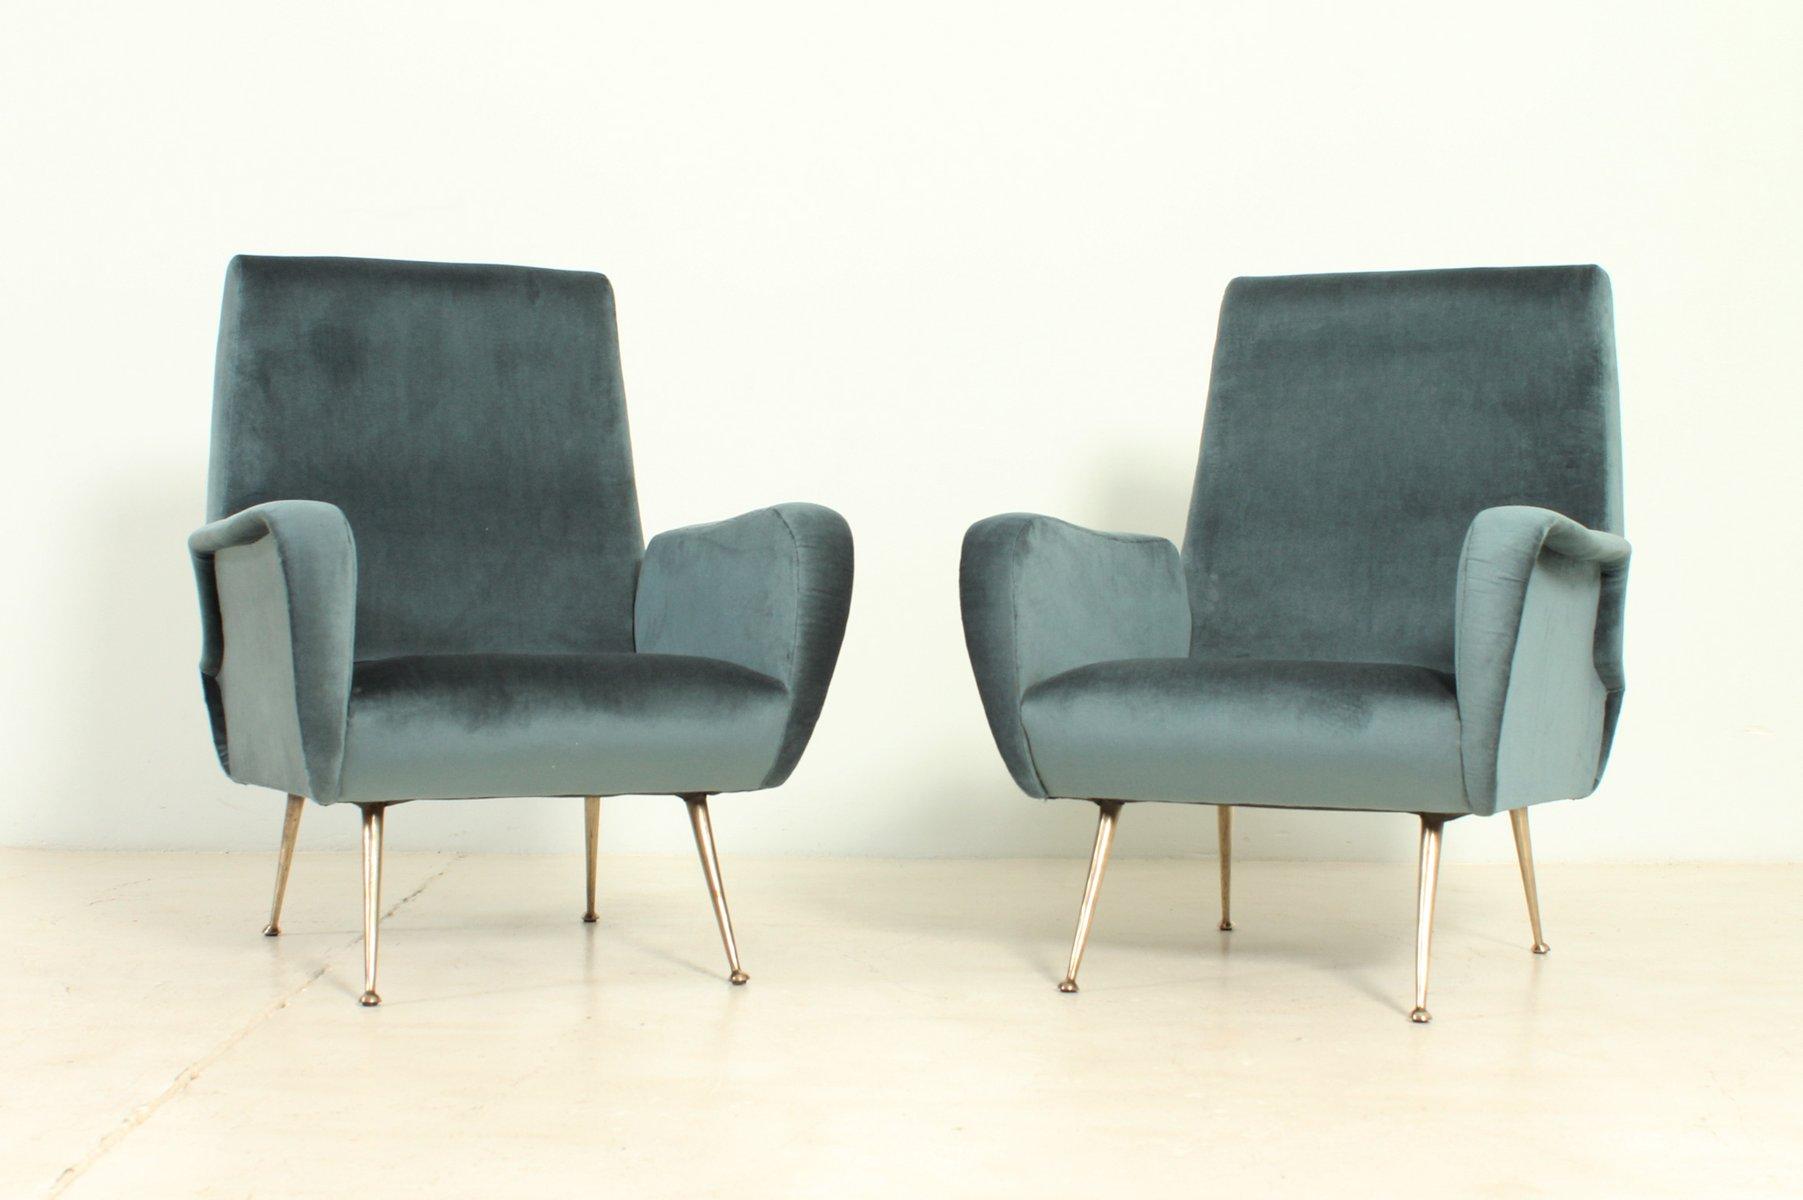 Vintage Italian Velvet Armchairs with Brass Legs 1950s Set of 2